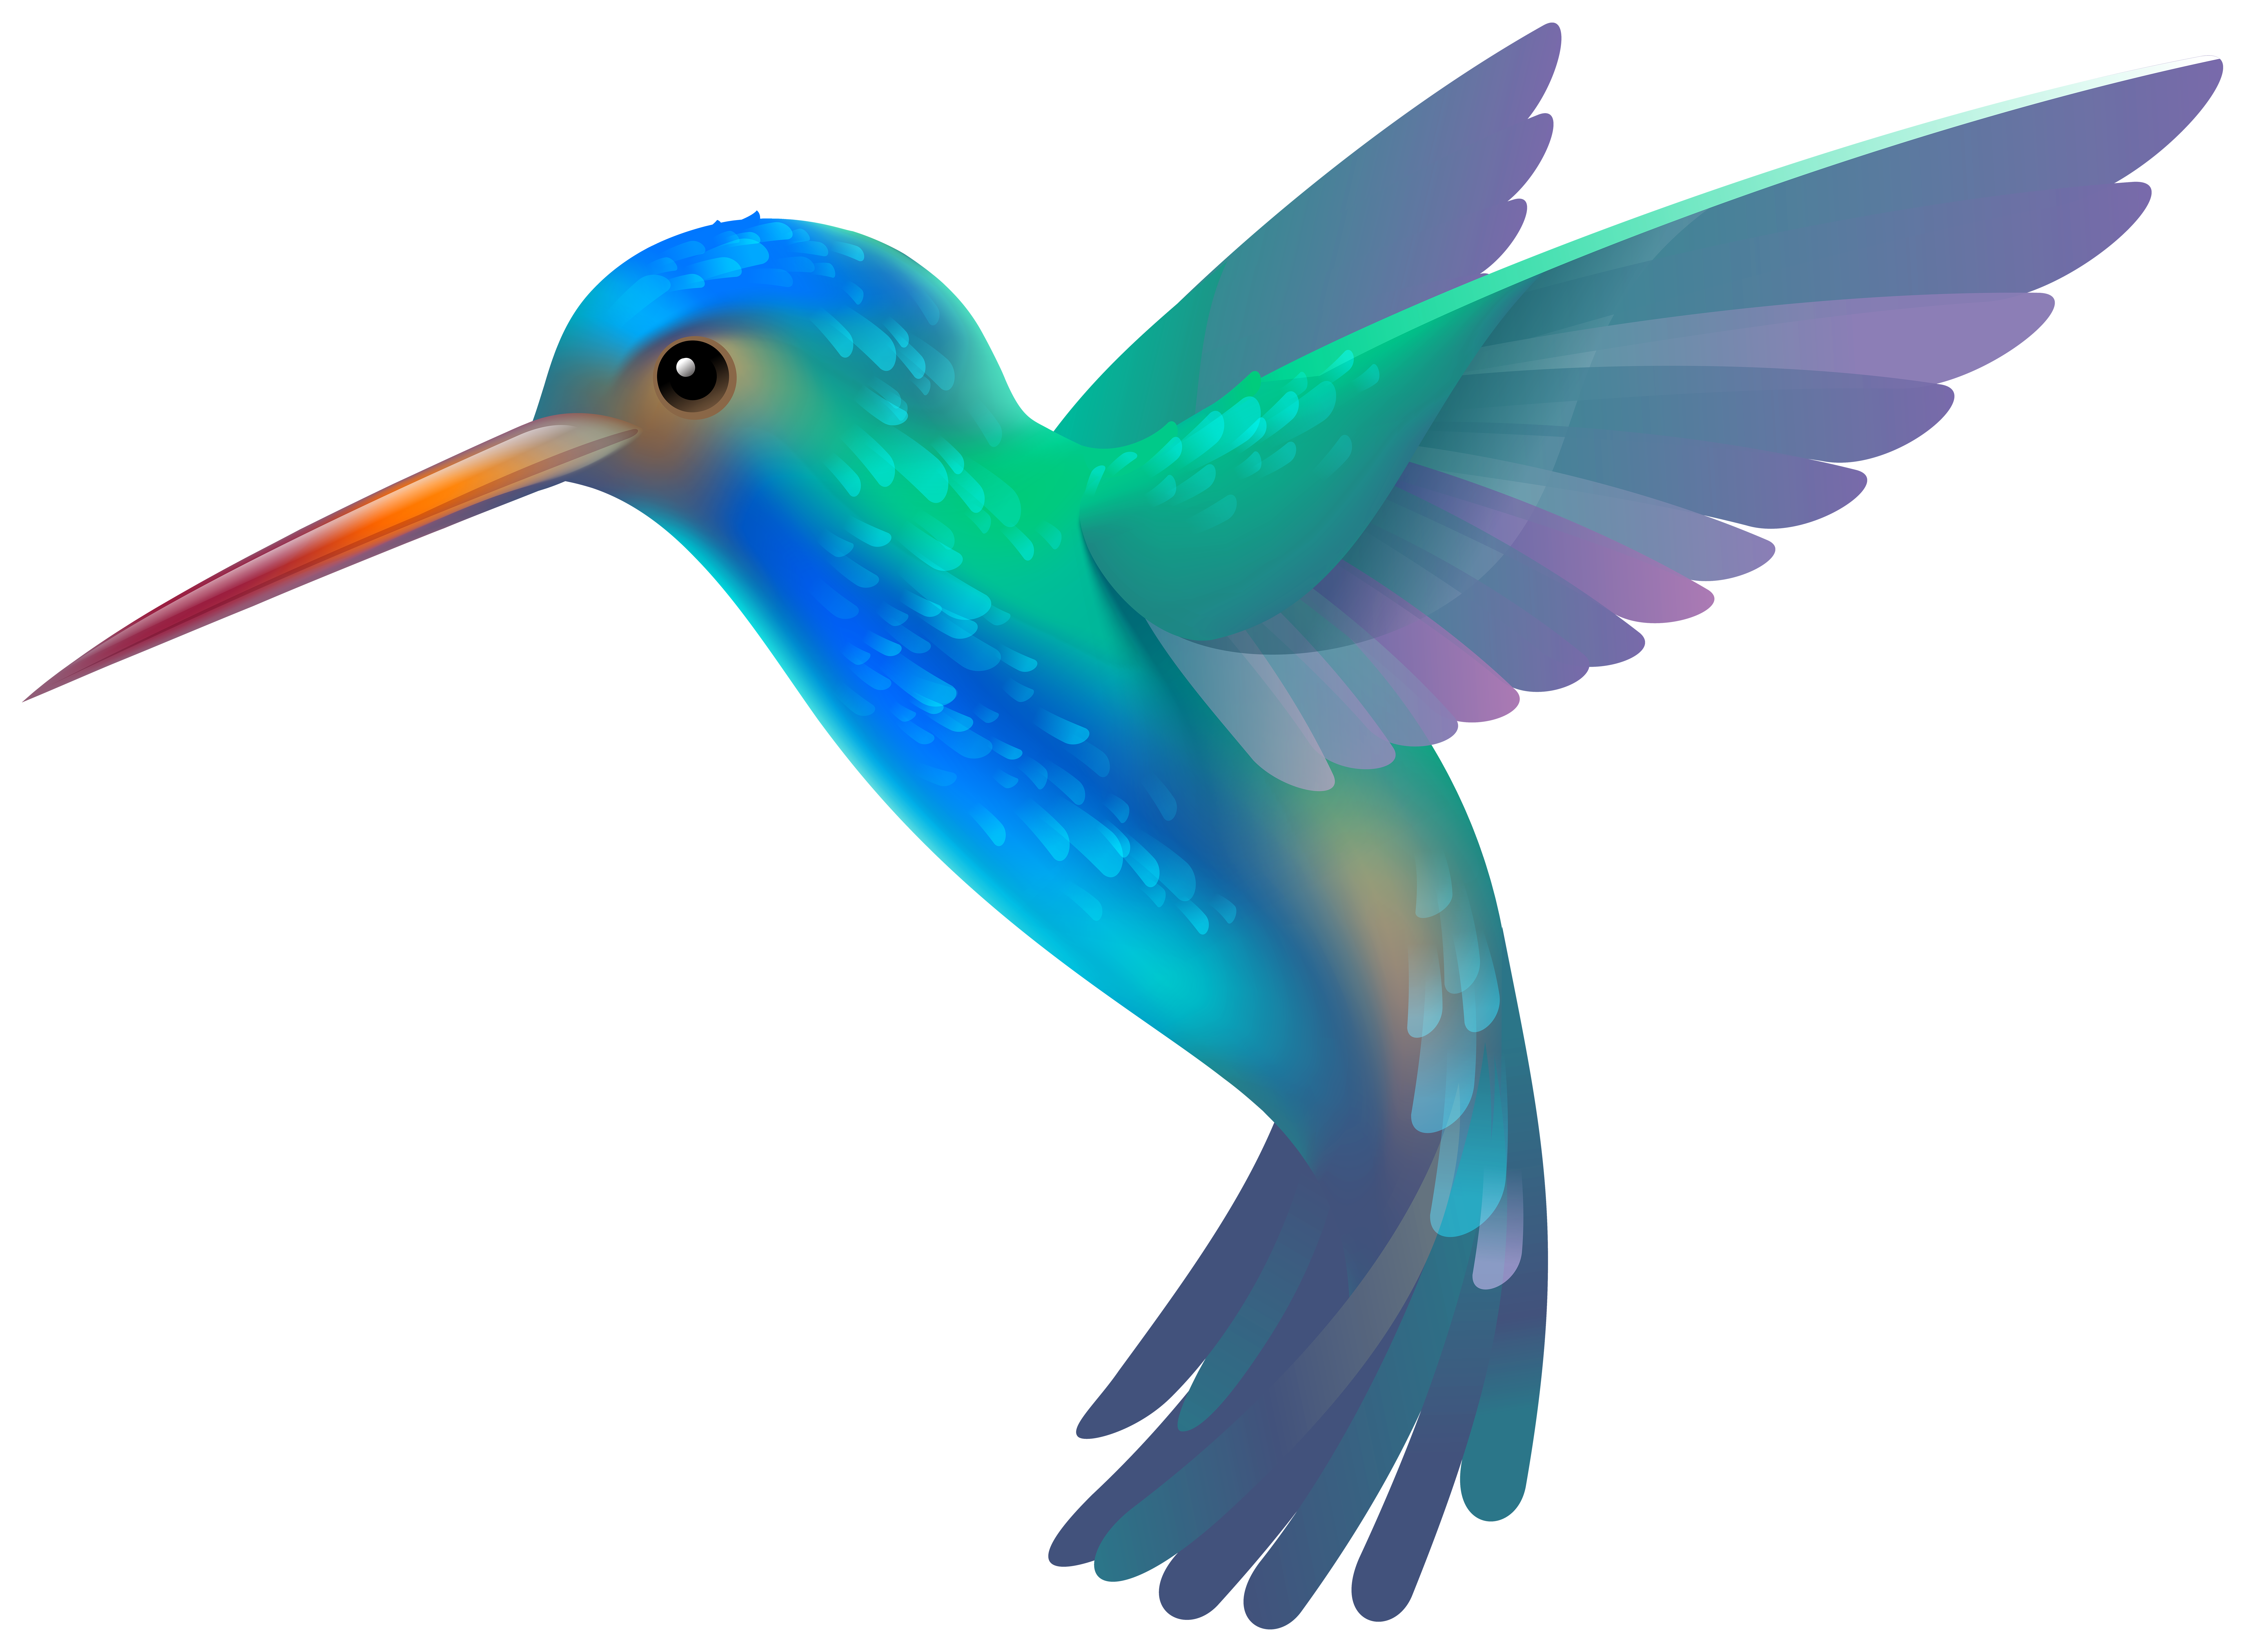 Hummingbird Transparent Clip Art Image-Hummingbird transparent clip art image-18